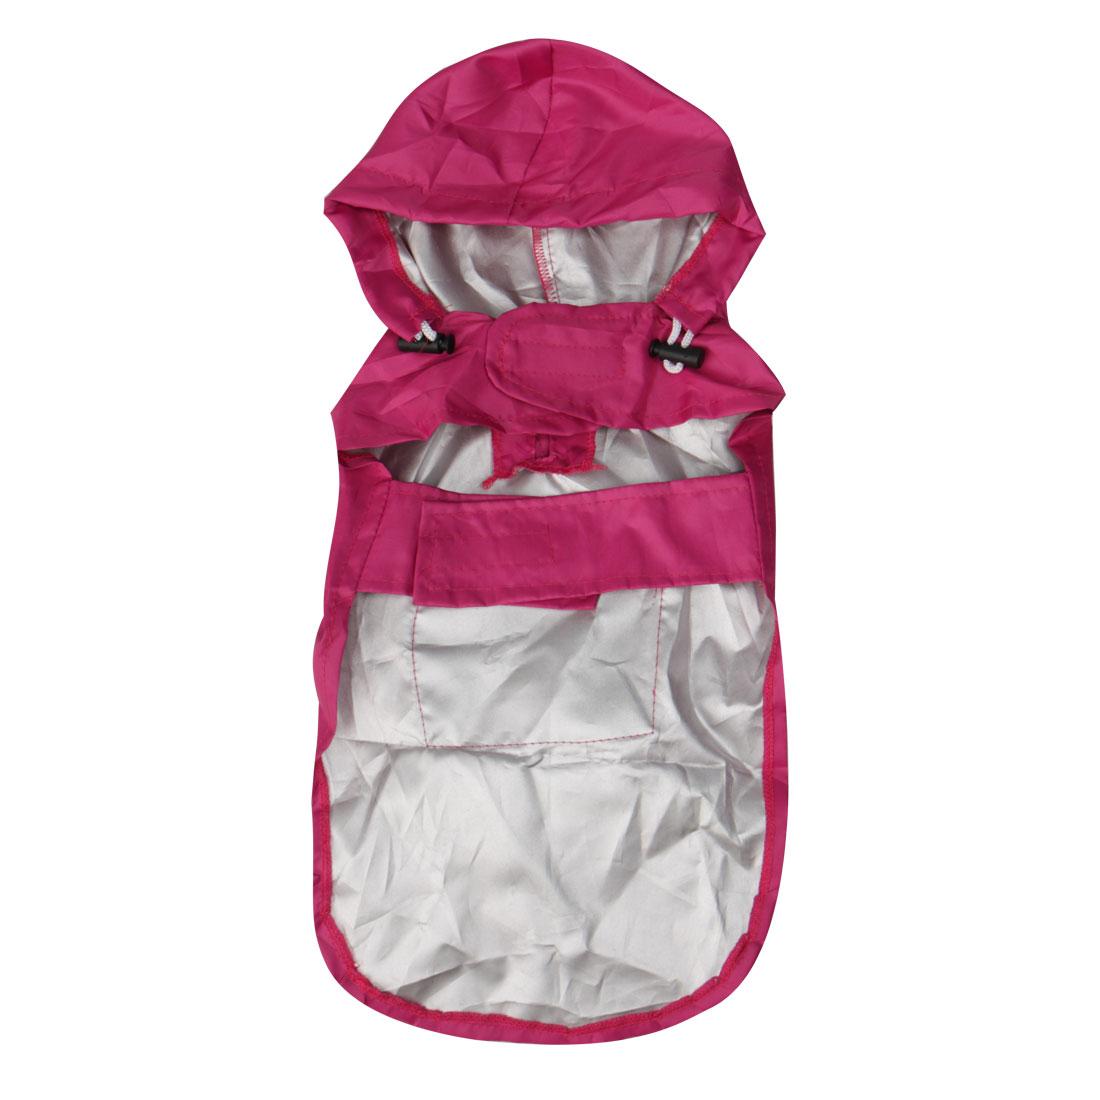 Pet Dog Raincoat Rain Jacket Nylon Water-resistant Rainwear Purple M